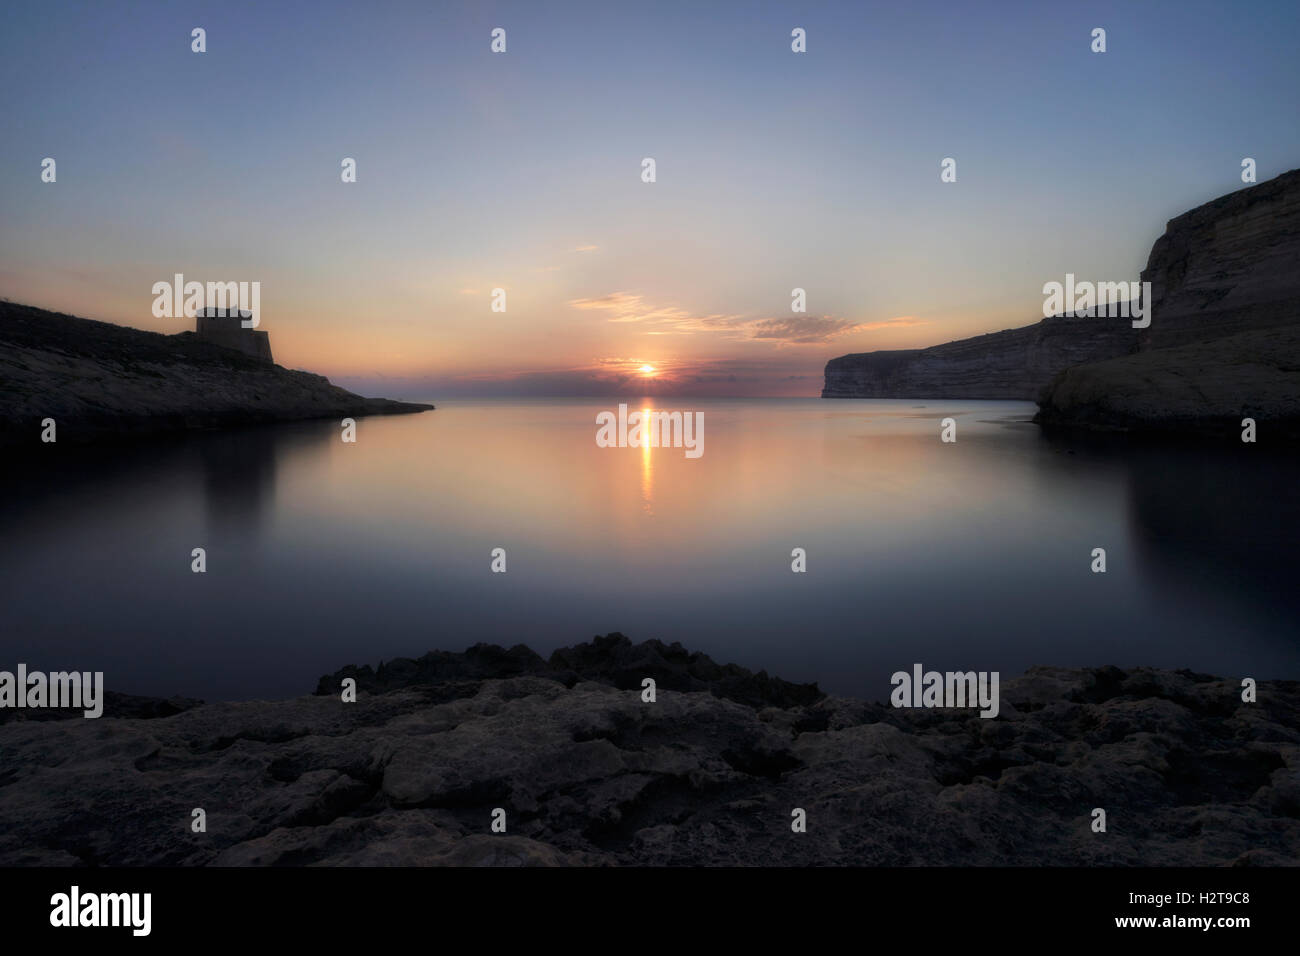 Xlendi Bay, Xlendi Turm, Gozo, Malta Stockbild